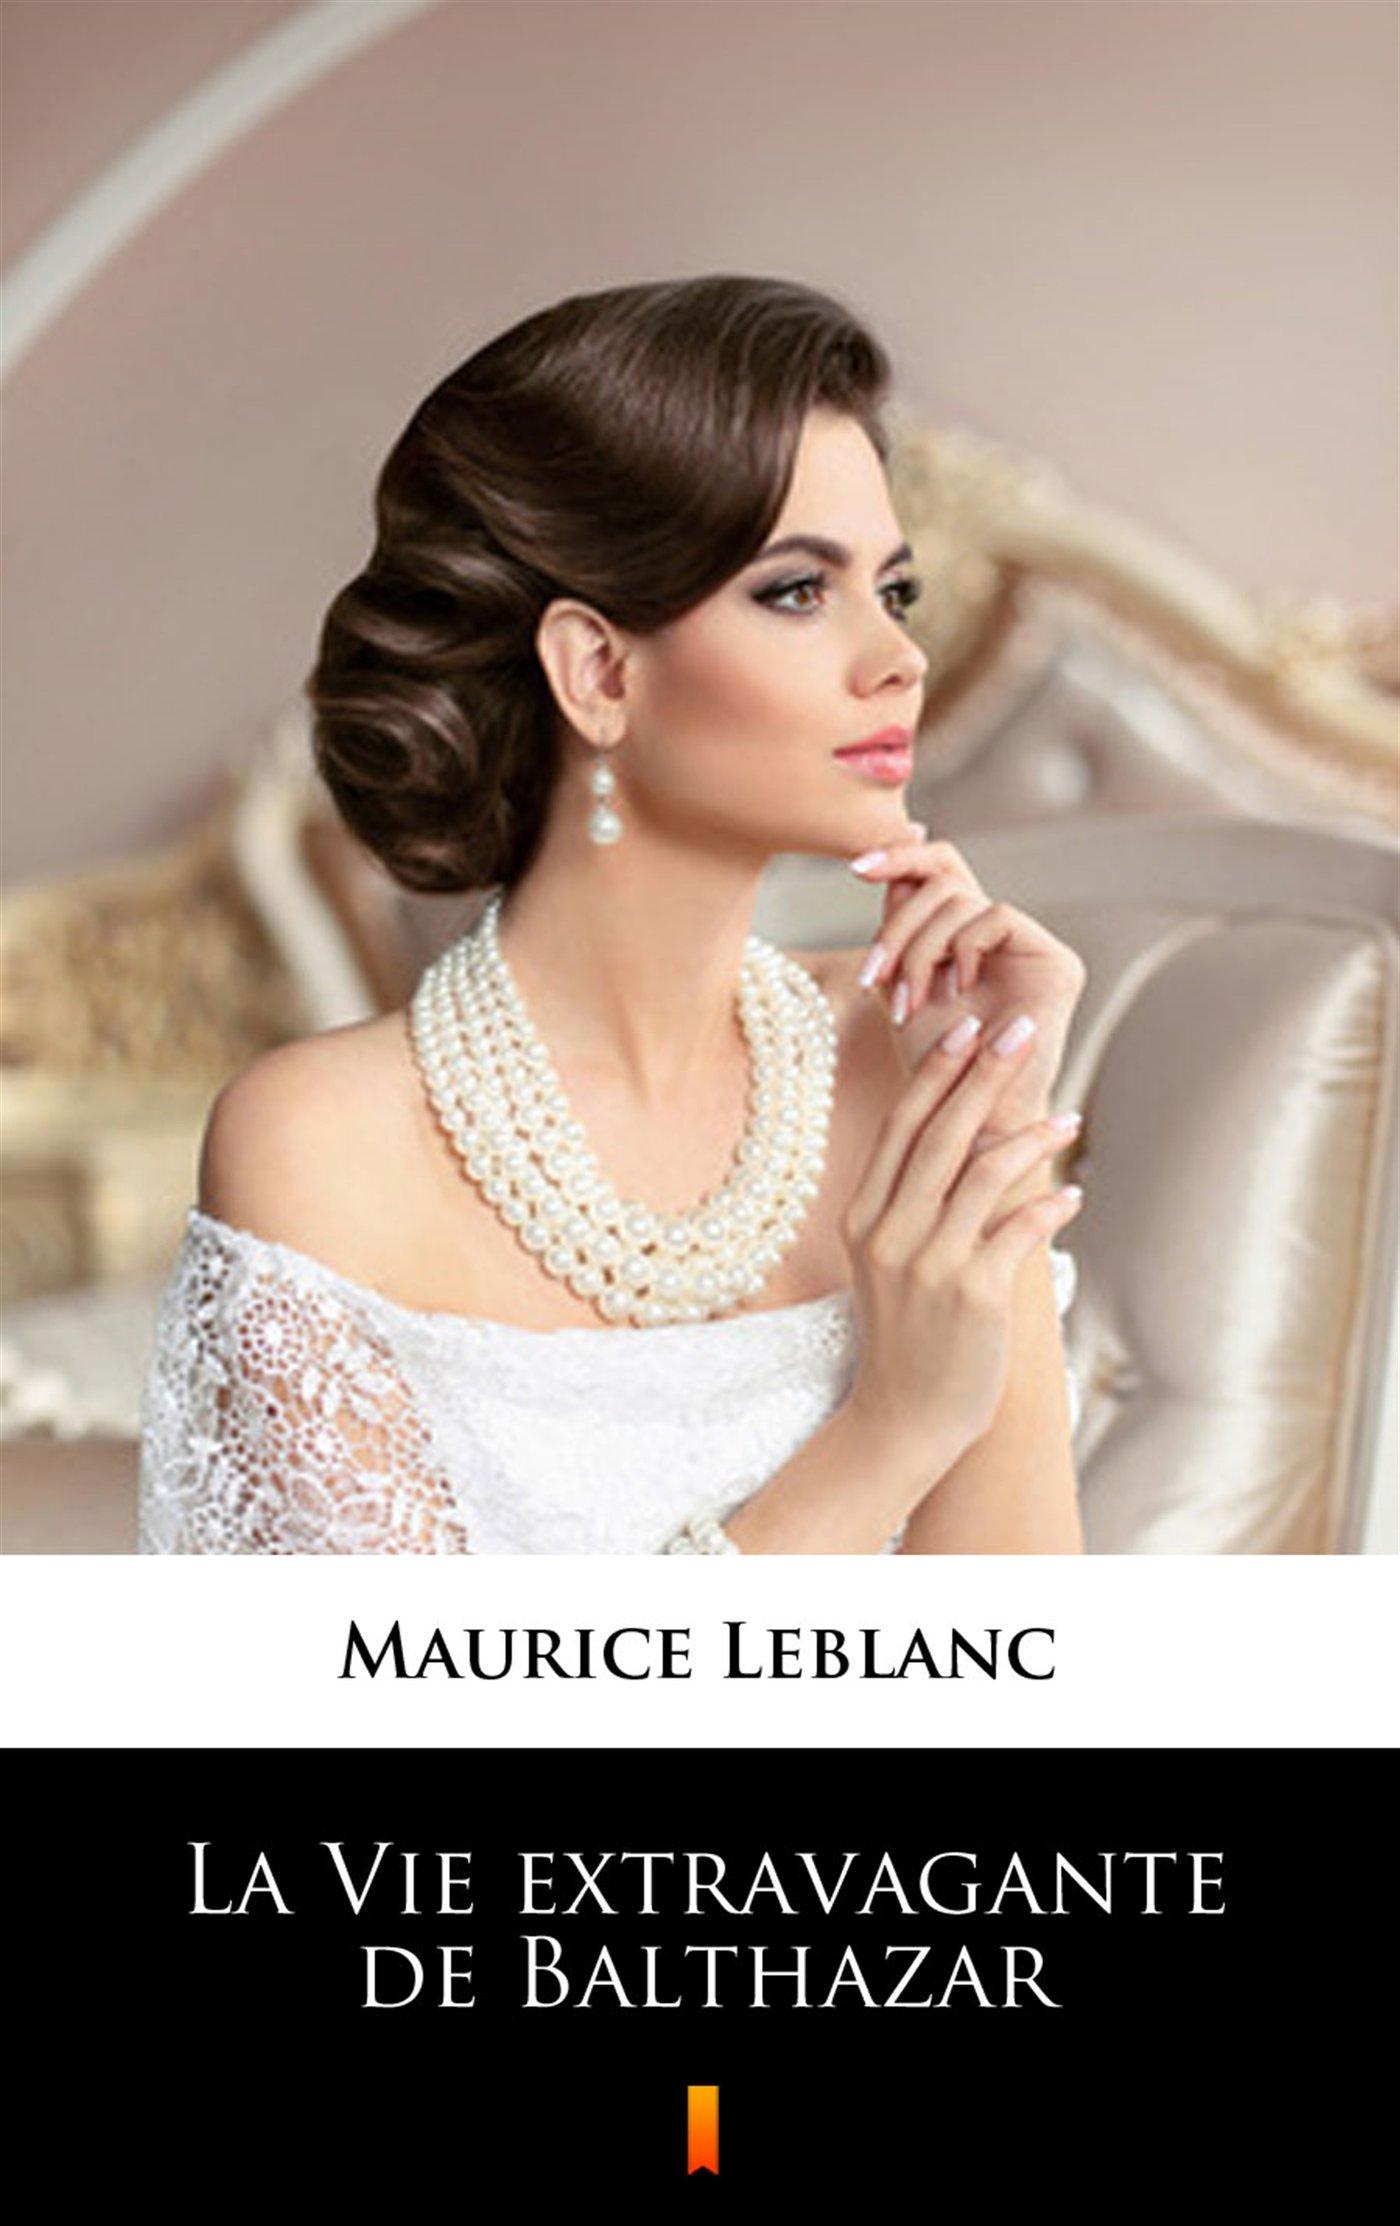 La Vie extravagante de Balthazar - Ebook (Książka na Kindle) do pobrania w formacie MOBI